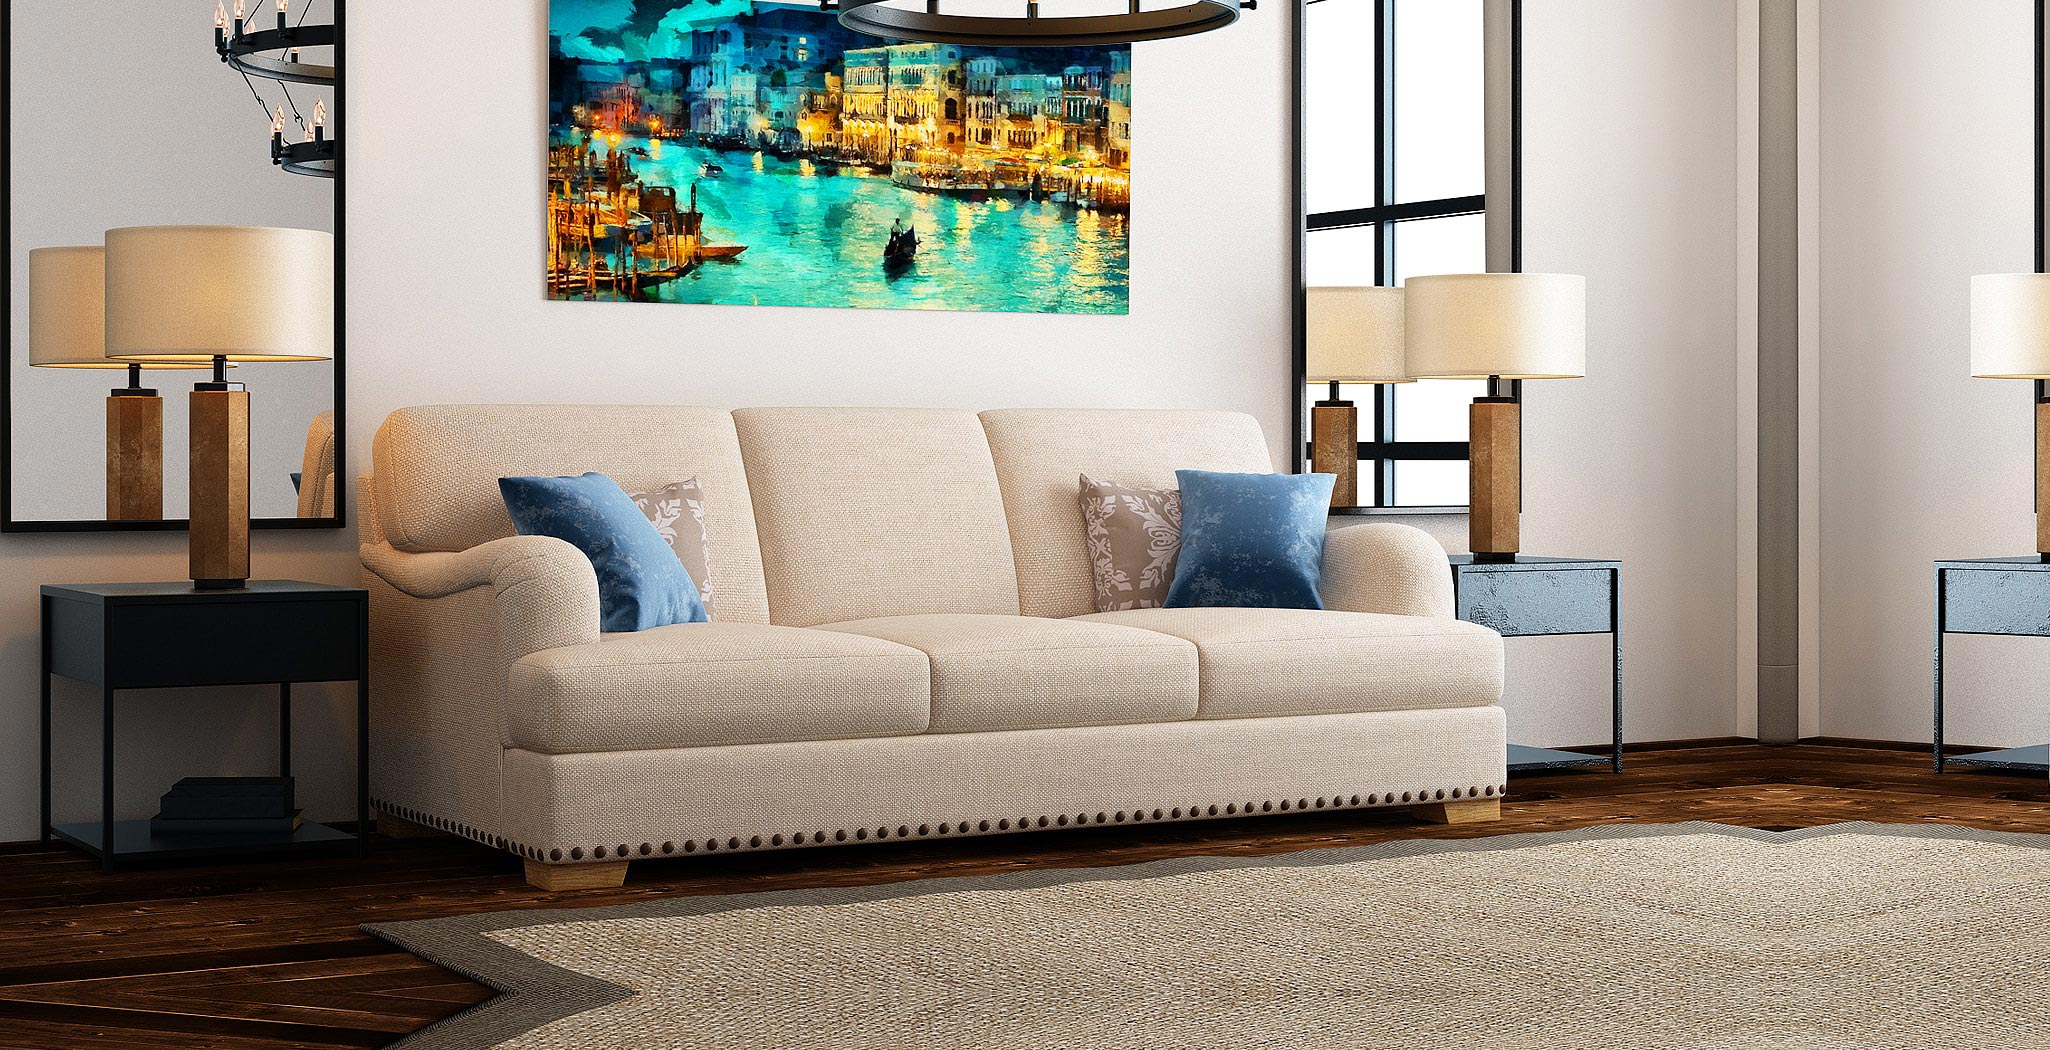 brighton sofa furniture gallery 1